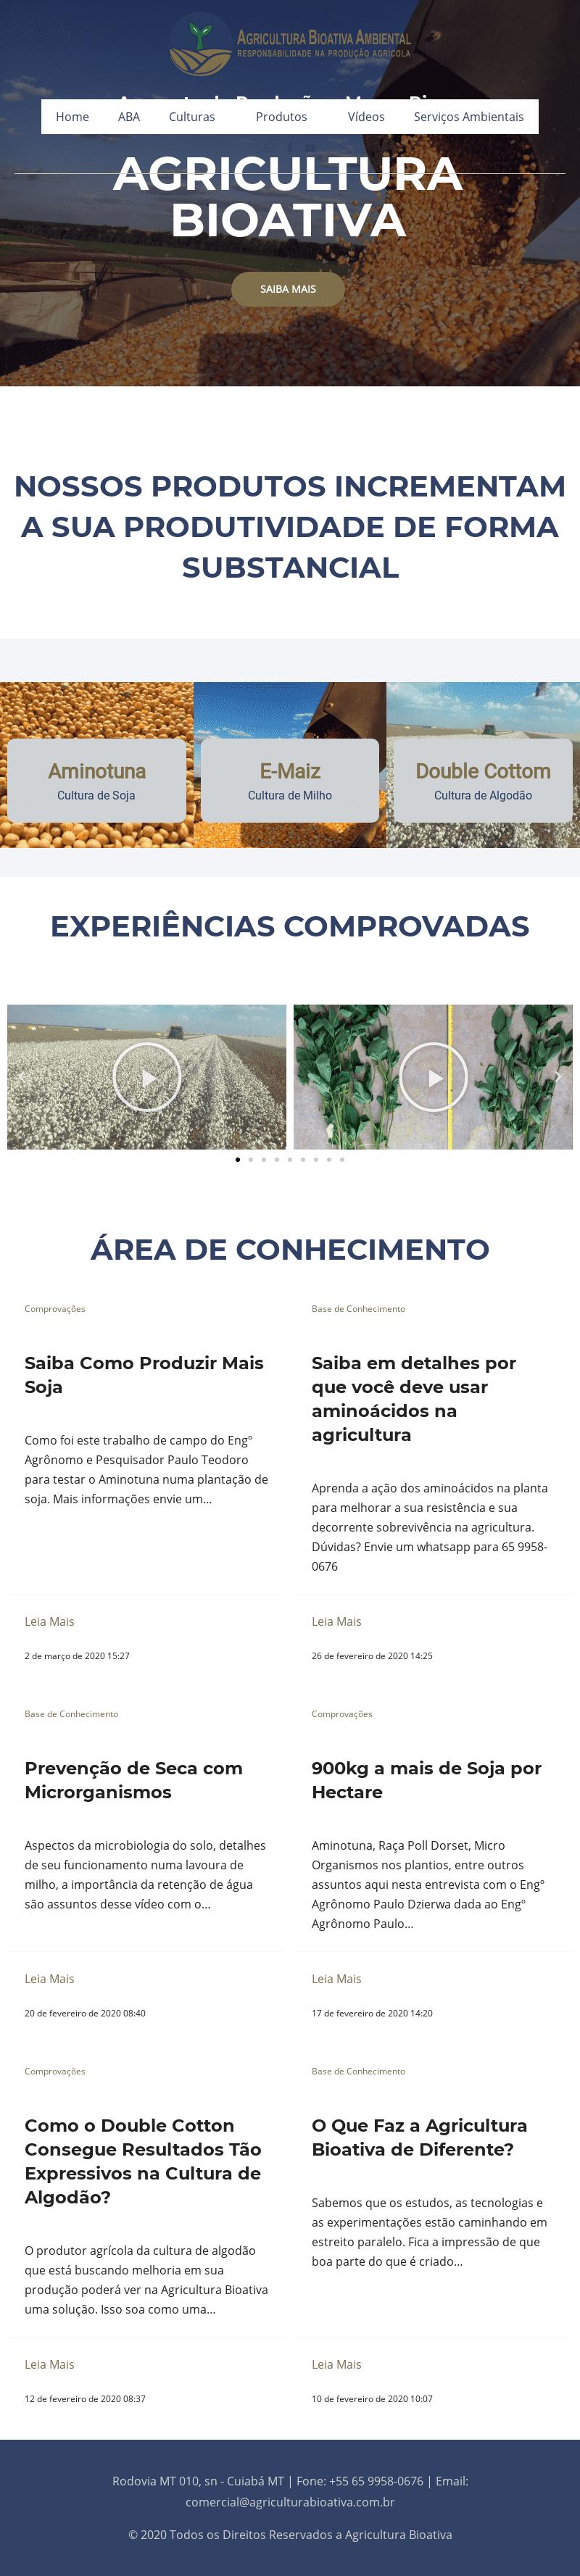 agriculturabioativa screenshot